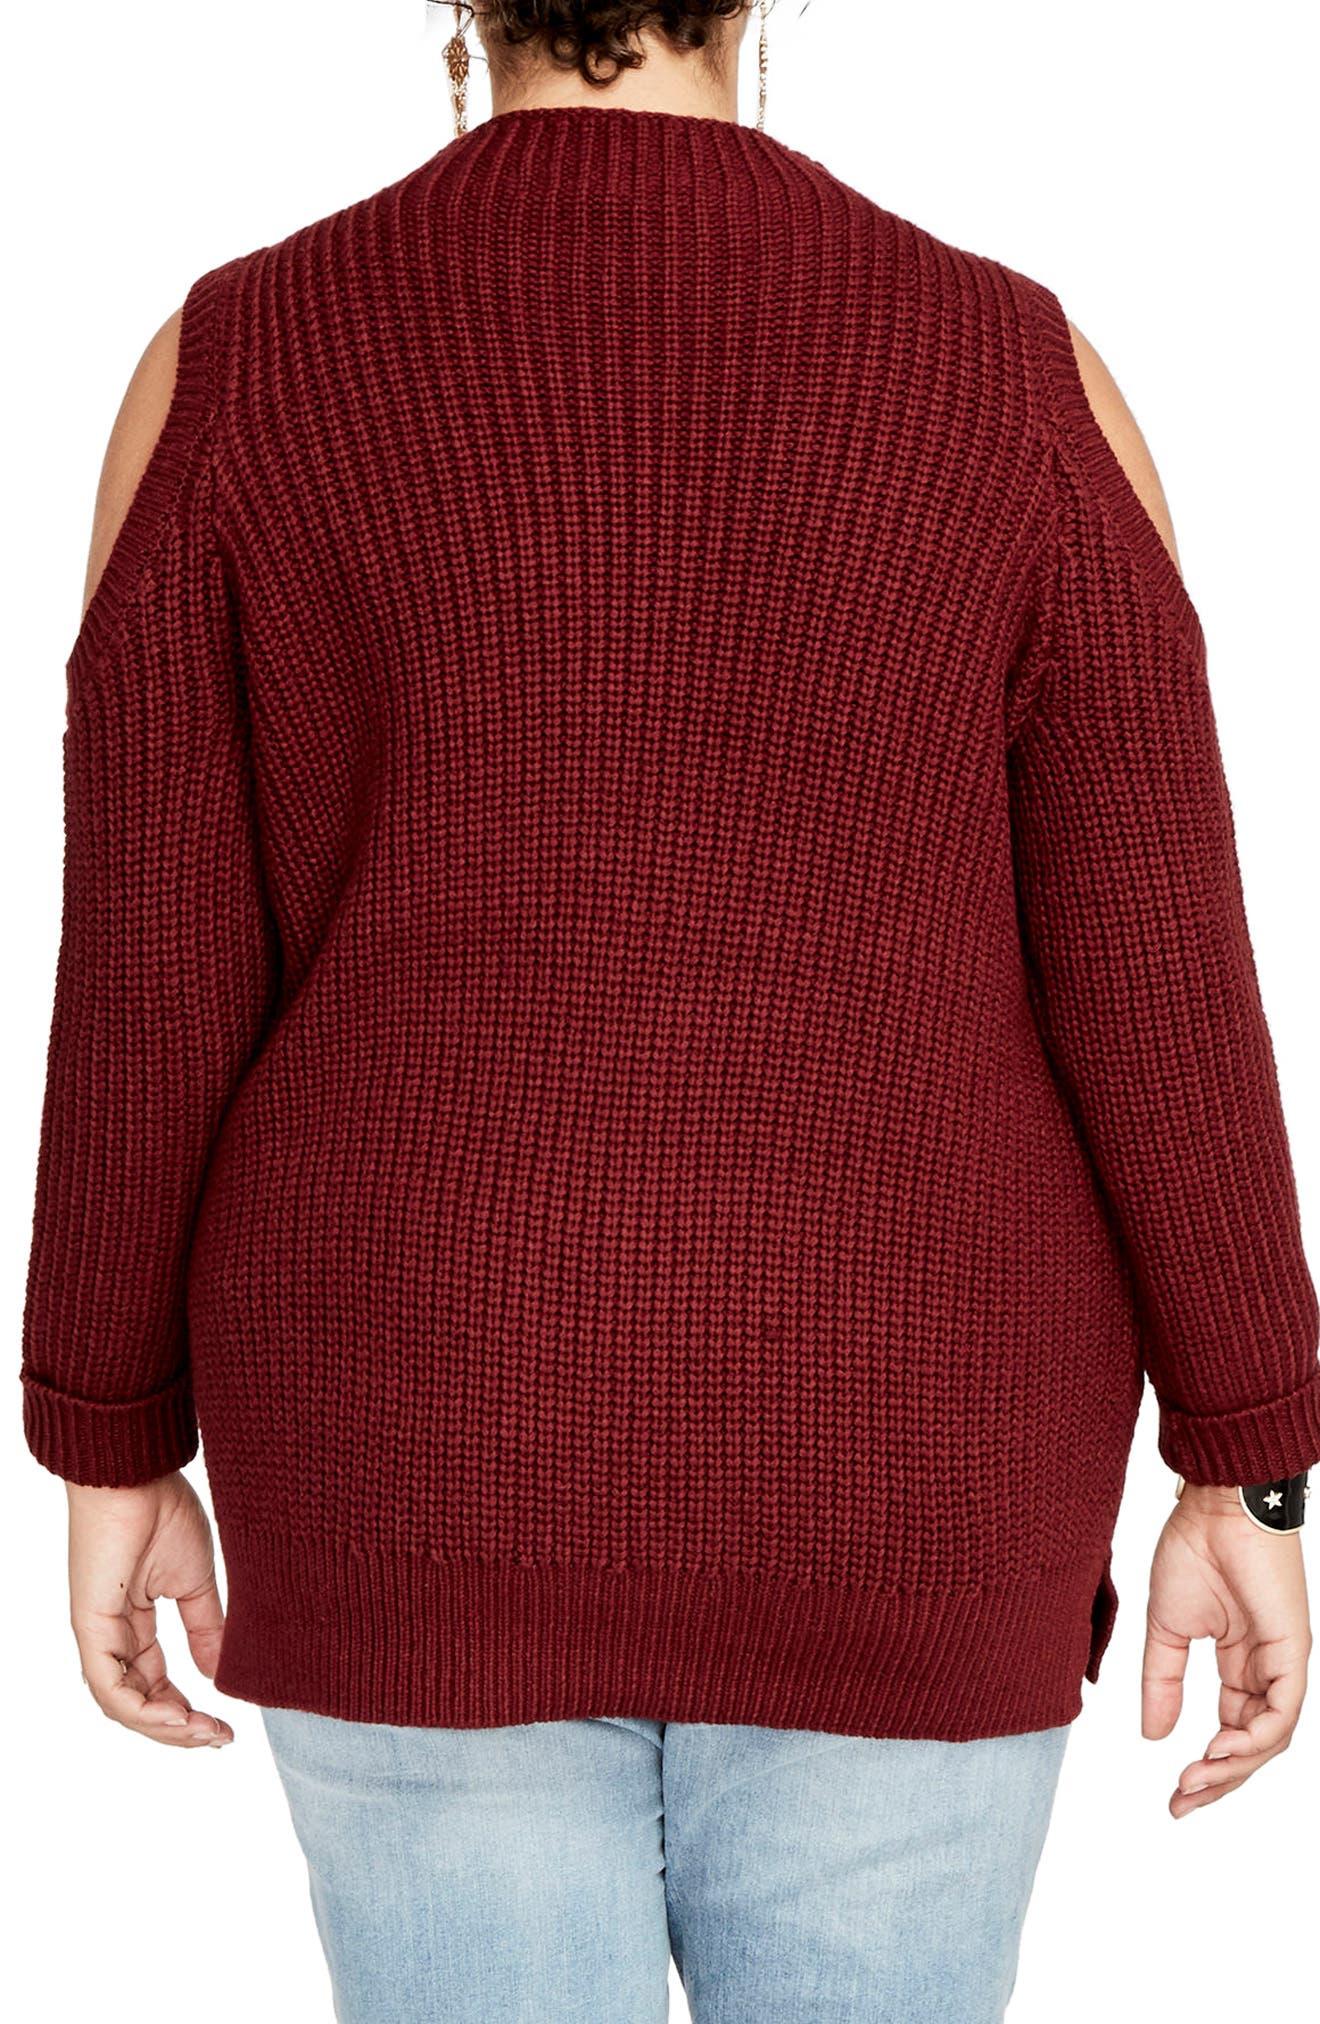 Cold Shoulder Cable Sweater,                             Alternate thumbnail 2, color,                             Port